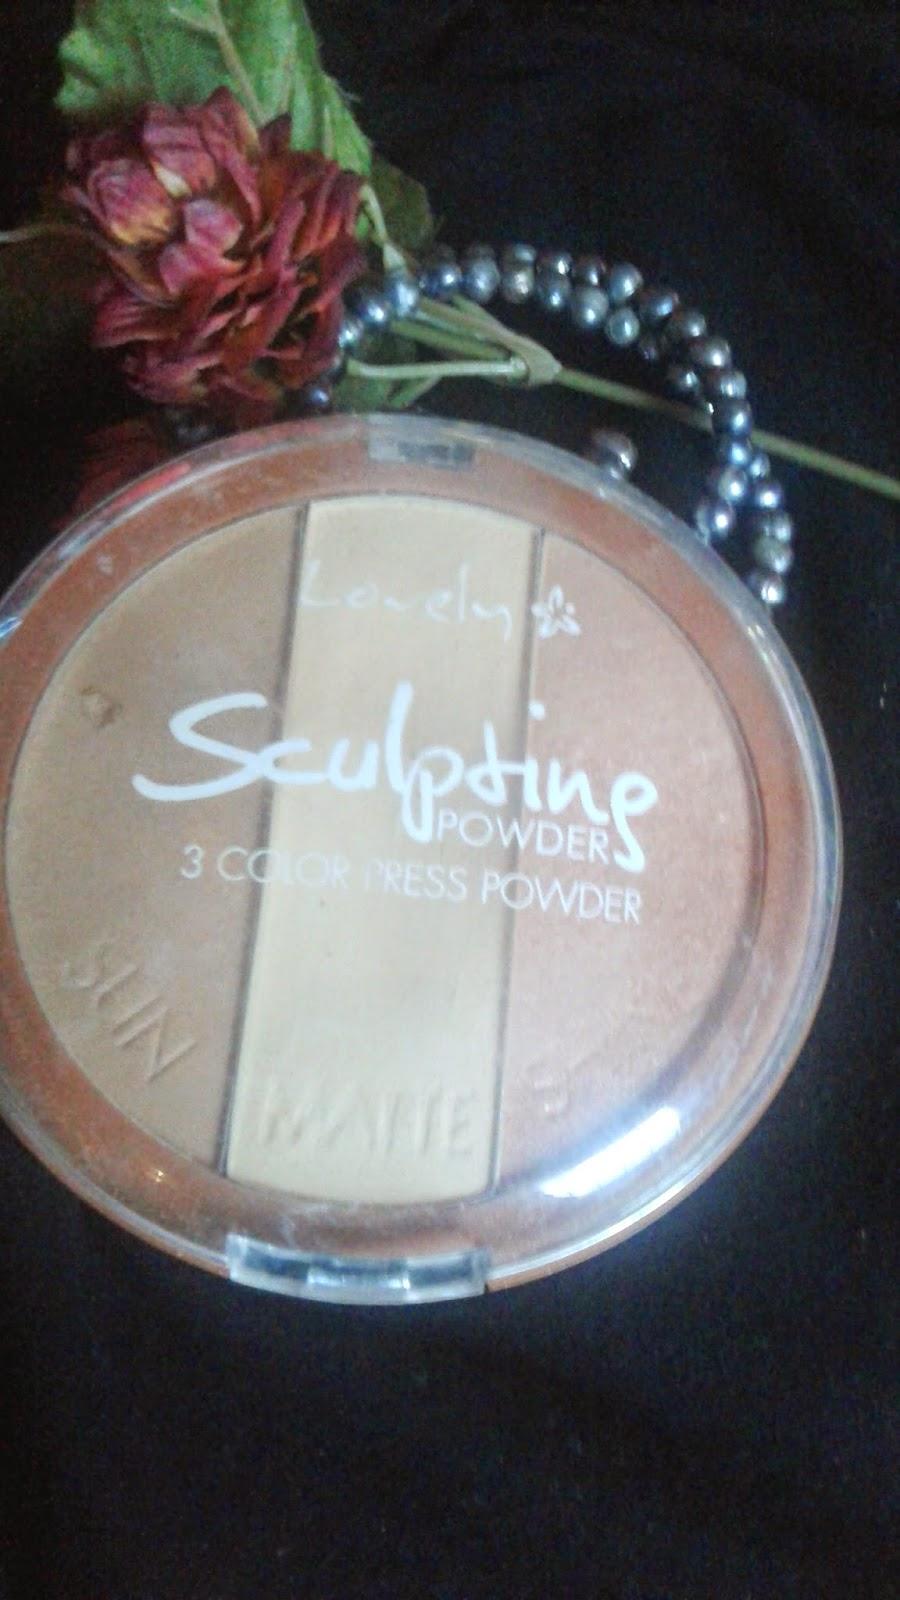 Top 10 kosmetyków... #8 Lovely Sculpting Powder 3 Colors Press Powder